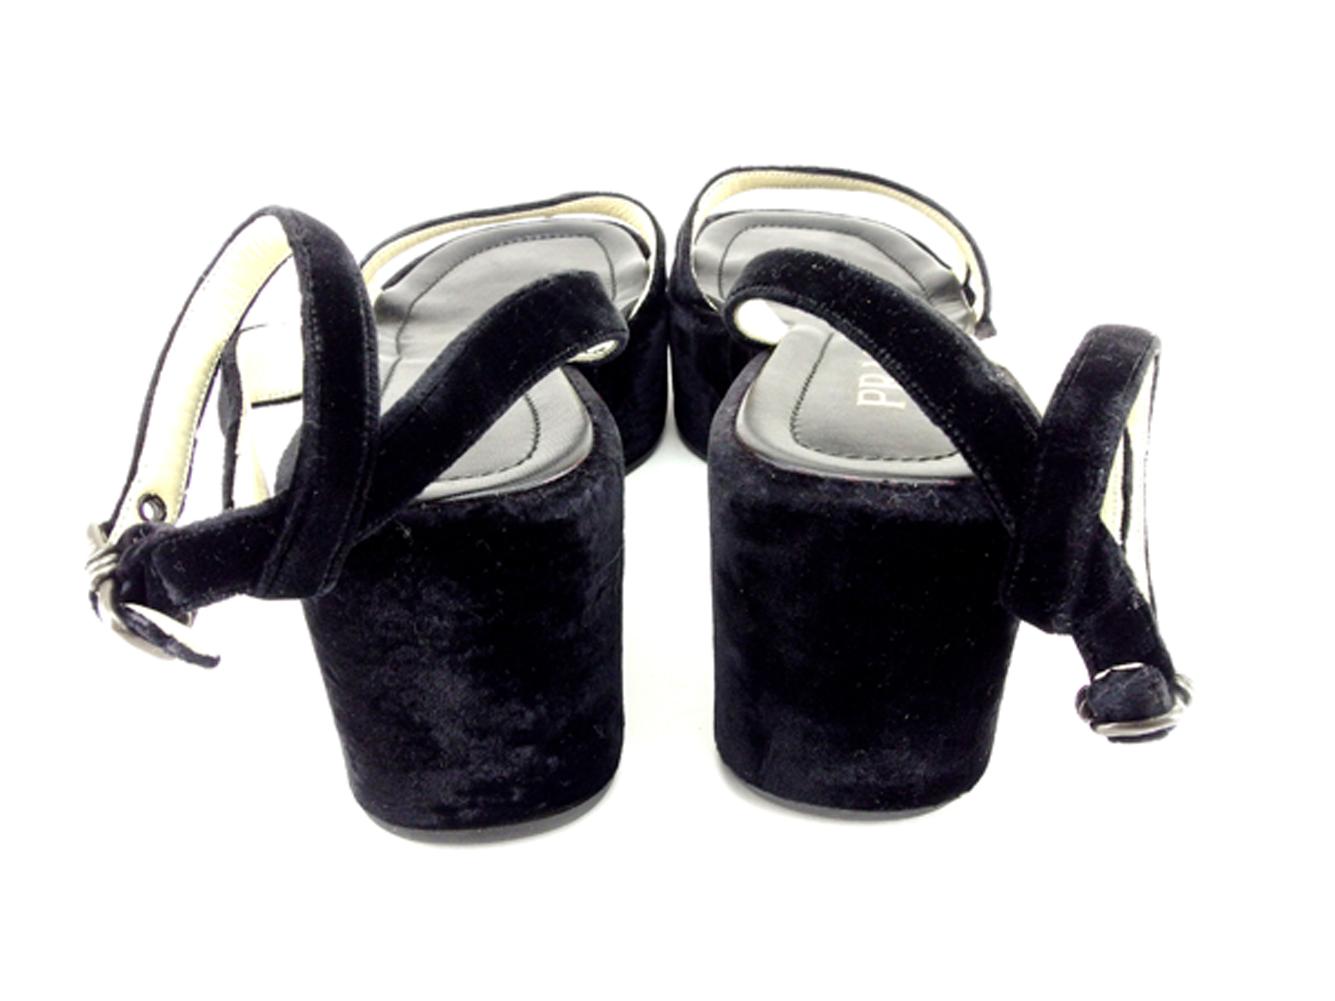 26159b8e553f ブラック #36 メンズ可 シューズ 靴 サンダル PRADA プラダ 【中古 ...